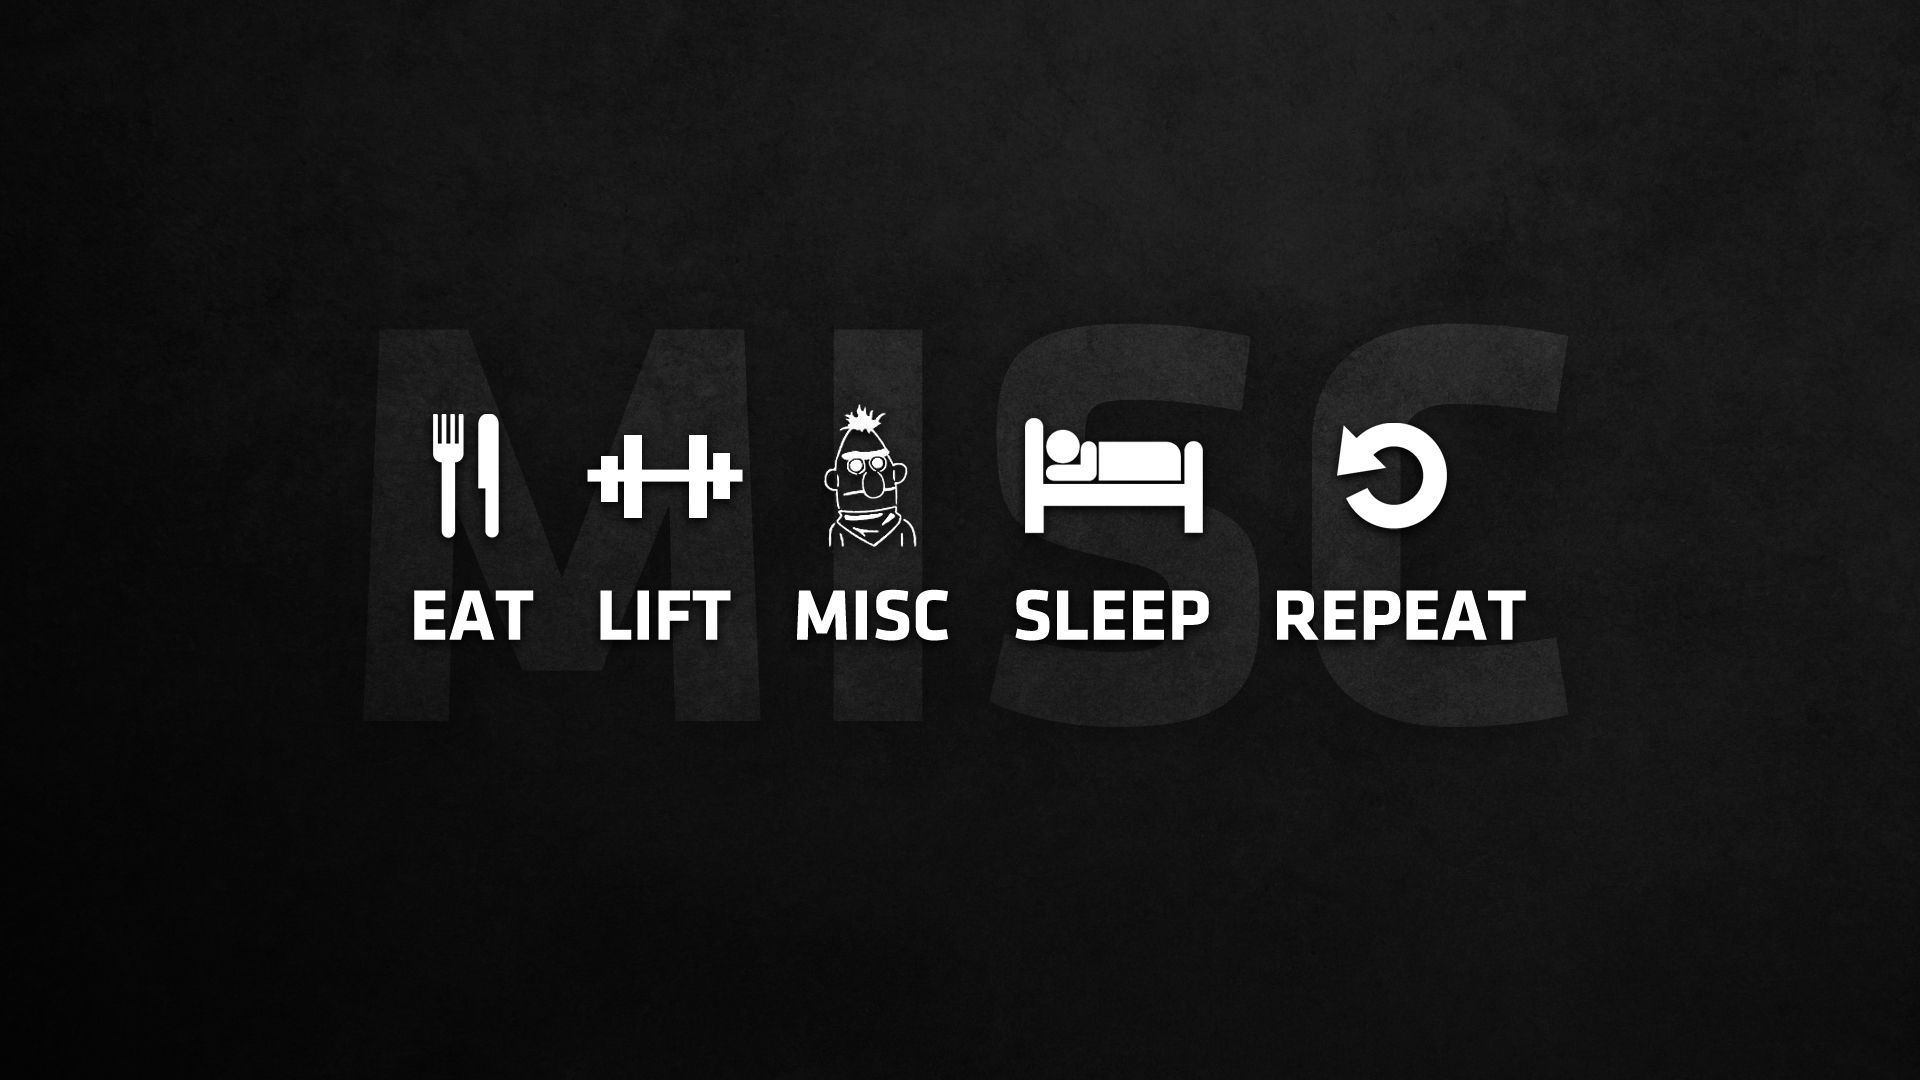 Eat Lift Misc Sleep Repeat WALLPAPER (PIC)   Bodybuilding.com Forums